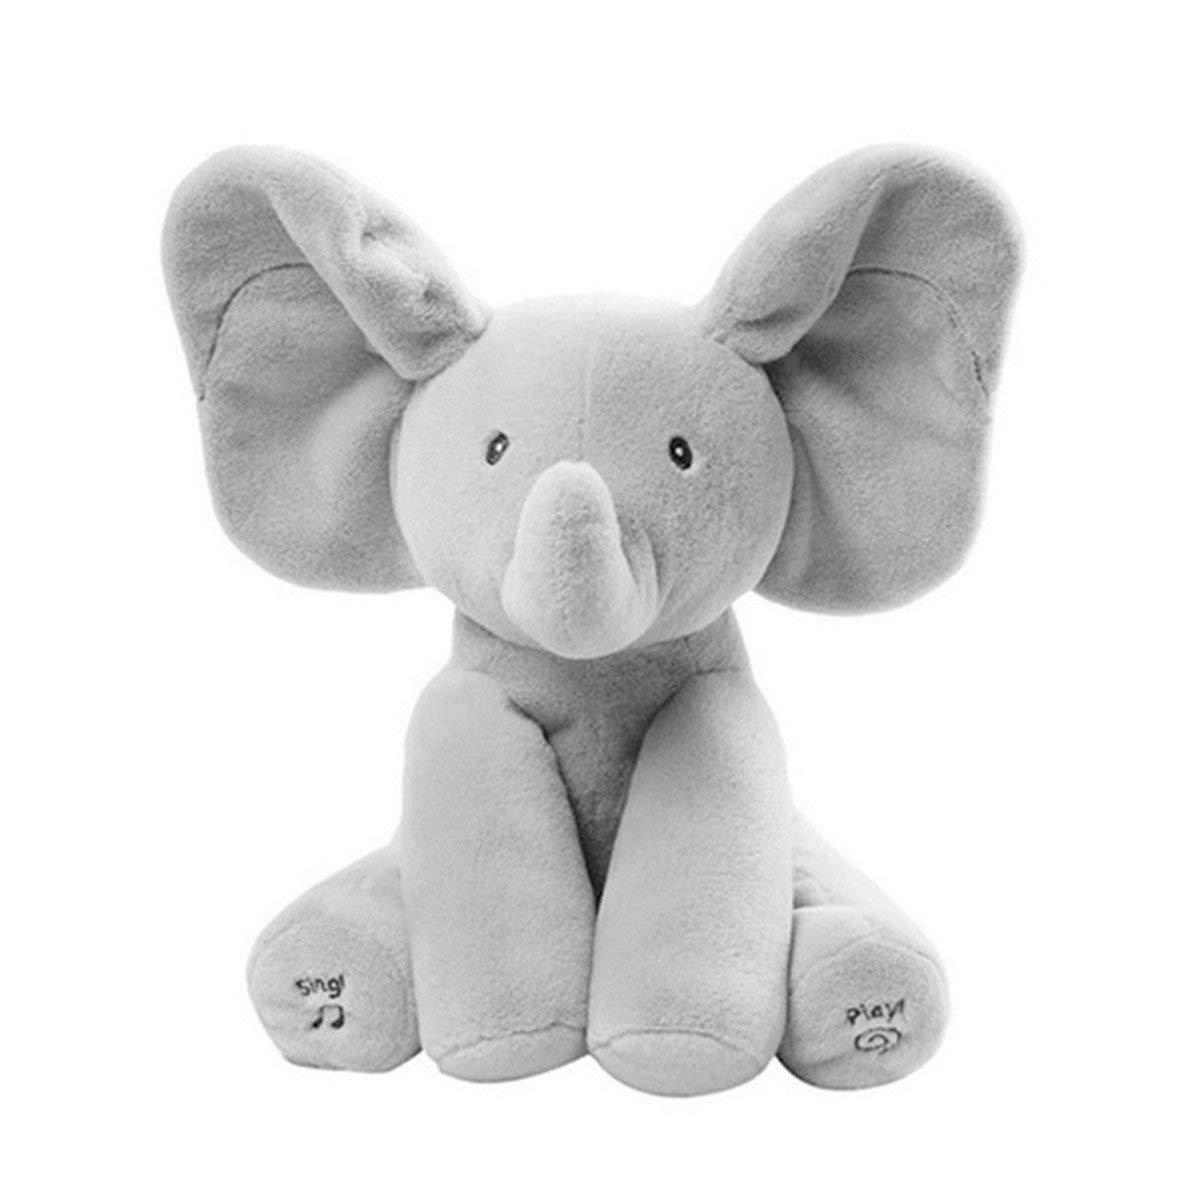 Peek-A-Boo Plushies elephanté™ flappy ear elephant plush toy SINGS 4 NURSERY RHYMES and PLAYS PEEKABOO with your baby